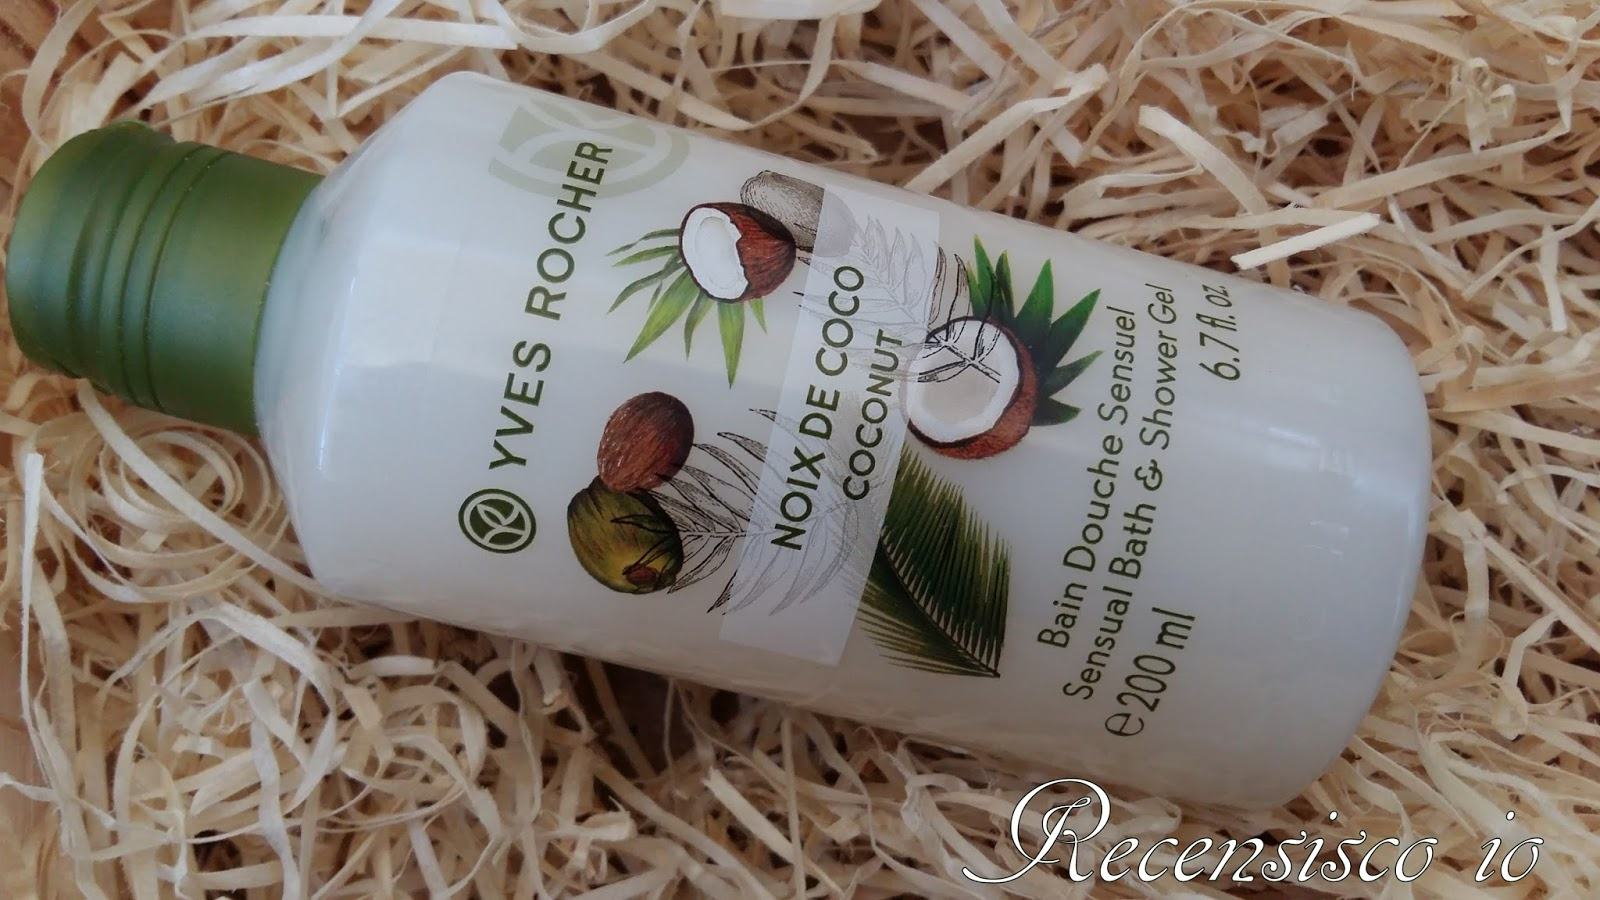 Bagno Doccia Yves Rocher.Recensisco Io Bellezza Naturale E Cosmetica Vegetale By Yves Rocher